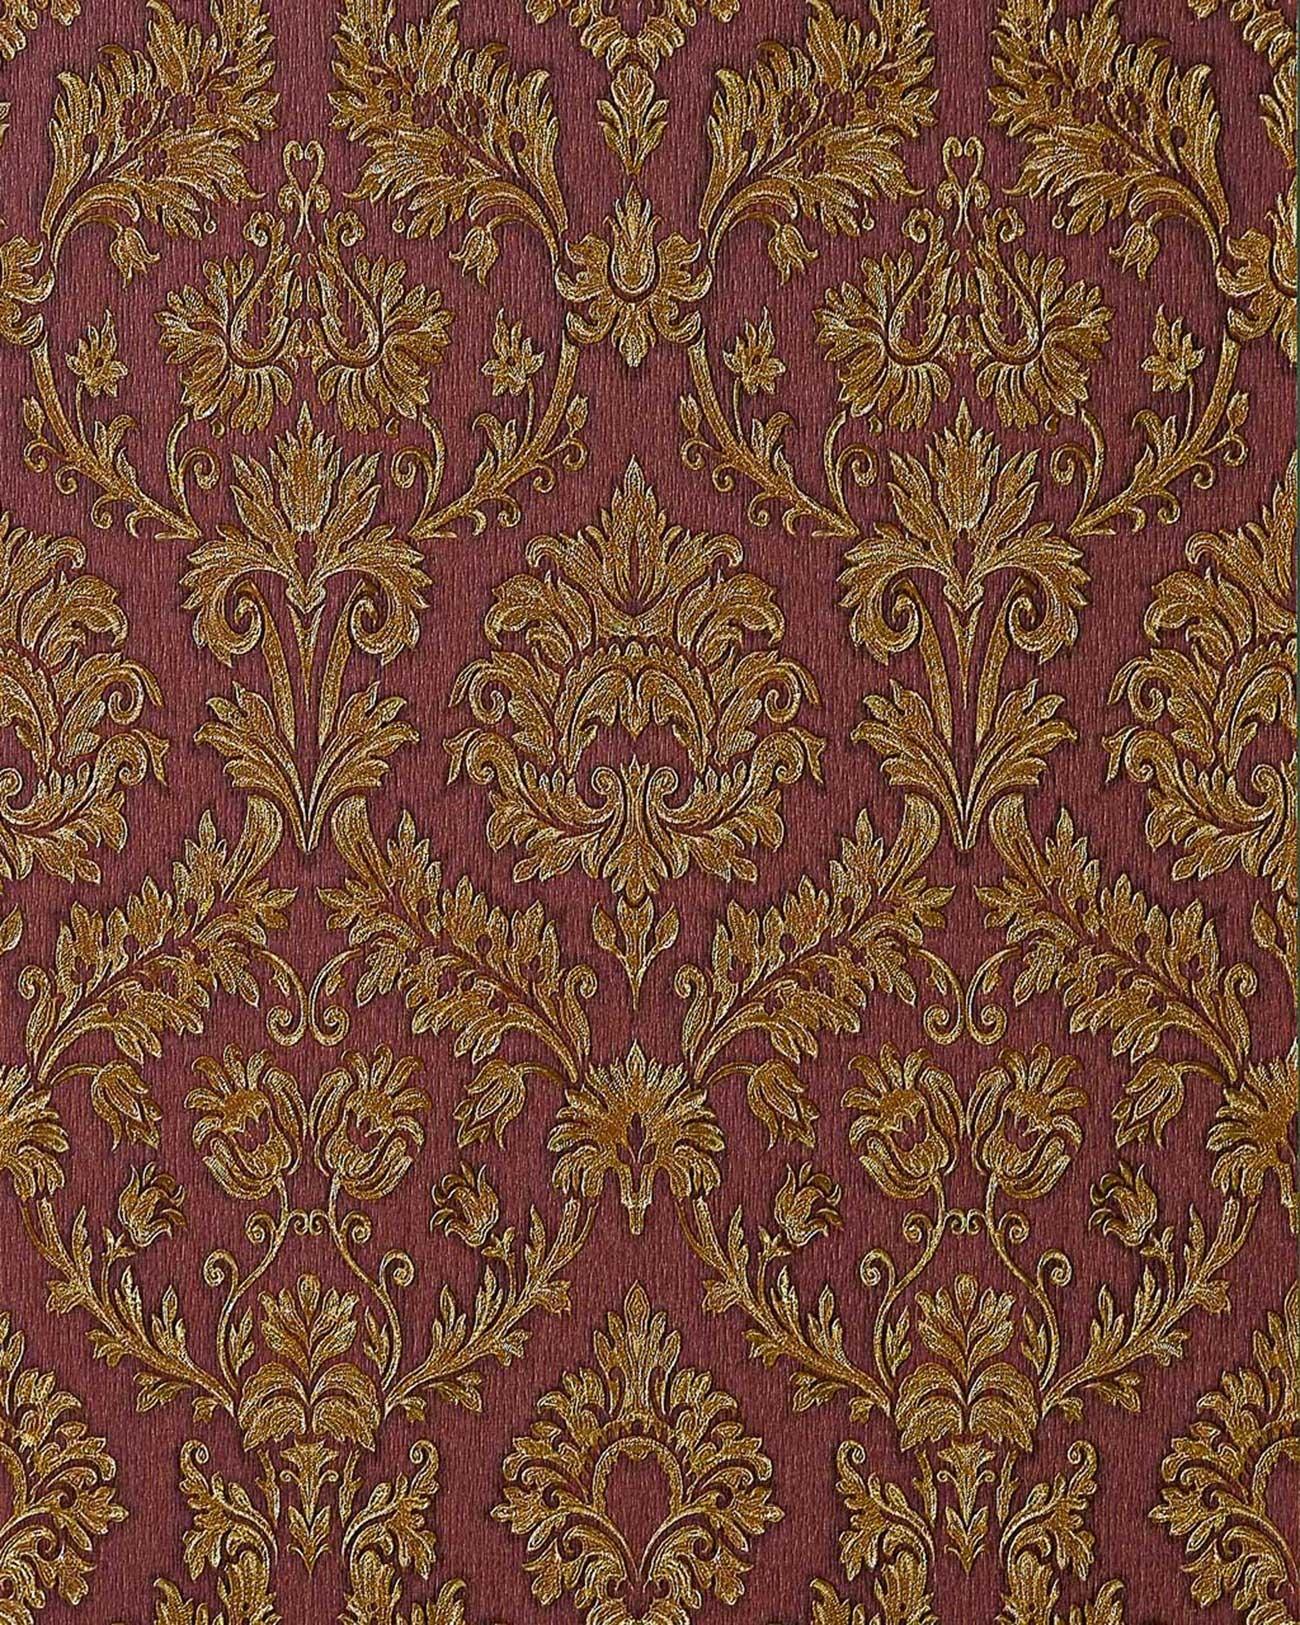 Carta da parati goffrata edem 708 36 barocco damasco in for Carta da parati damascata oro